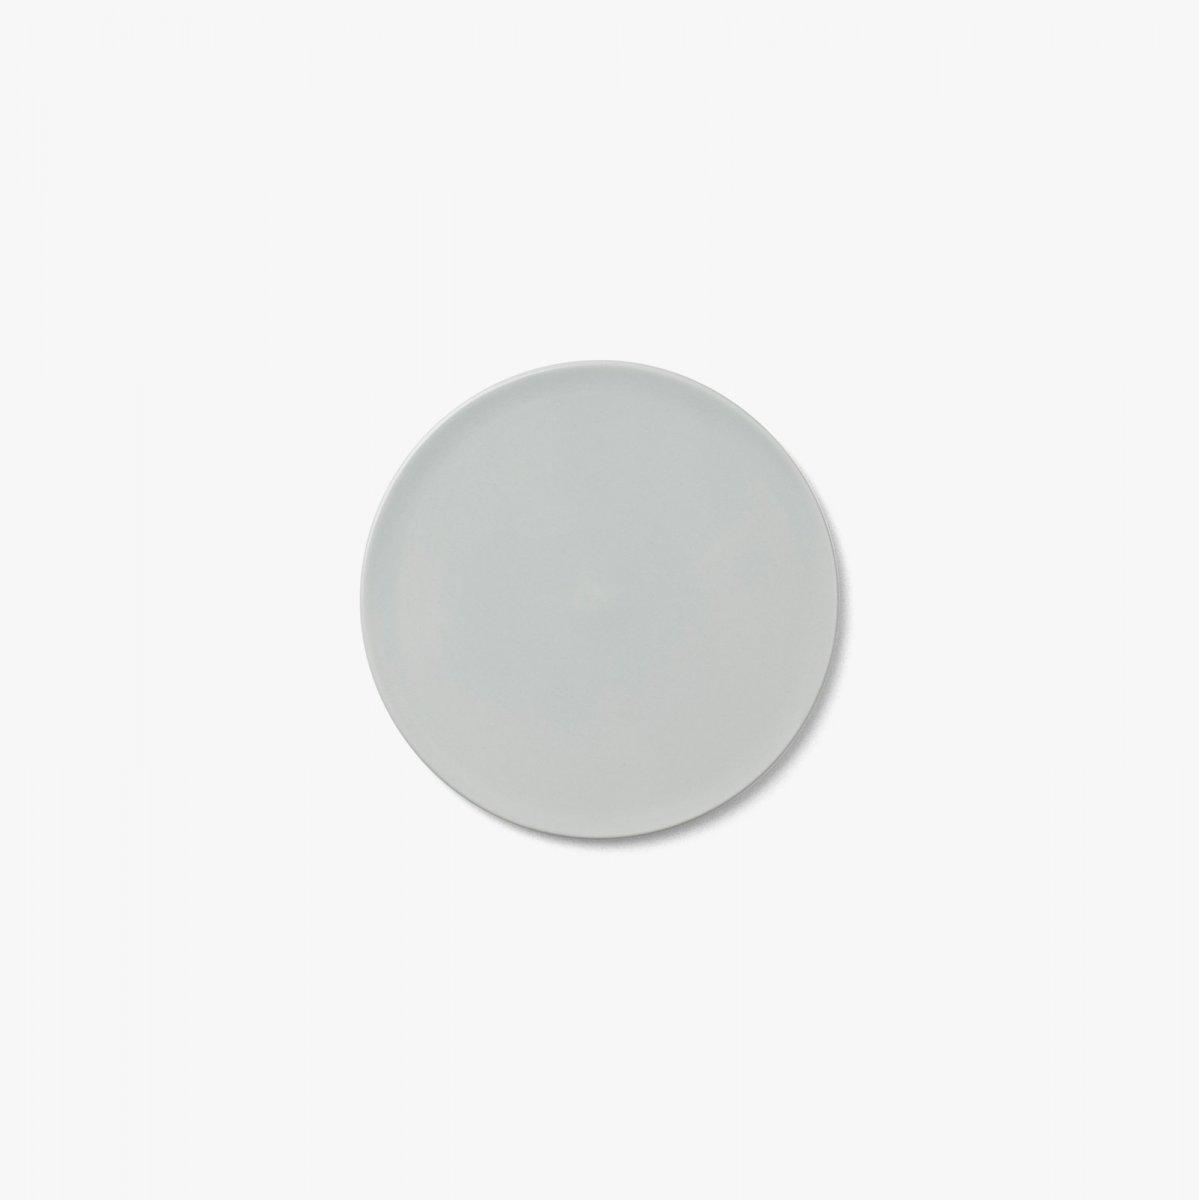 New Norm Plate/Lid, Ø 17.5 cm, smoke.